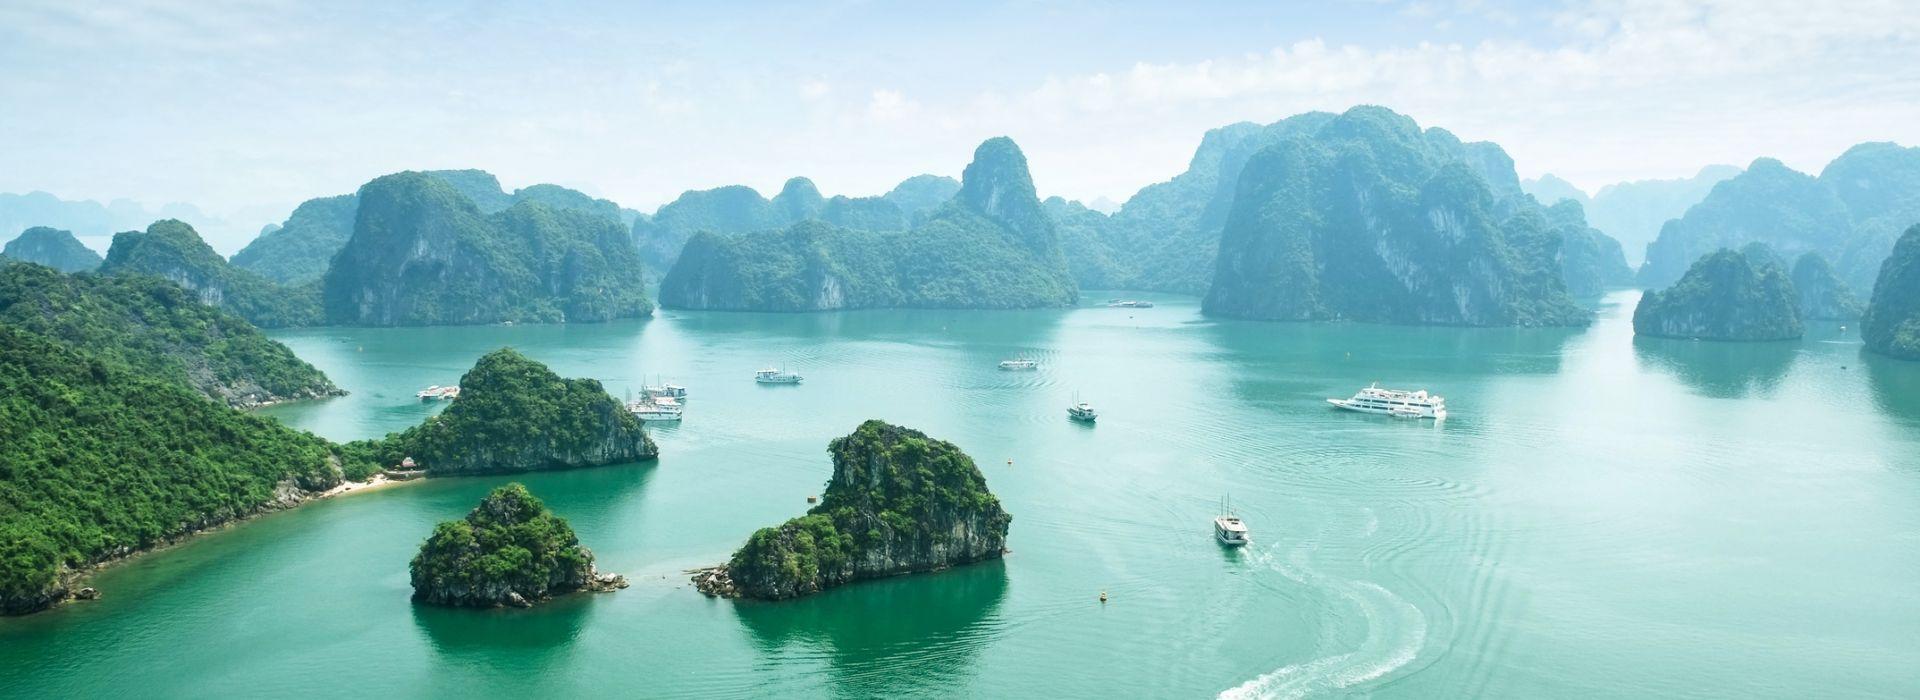 Cruise Tours in Vietnam